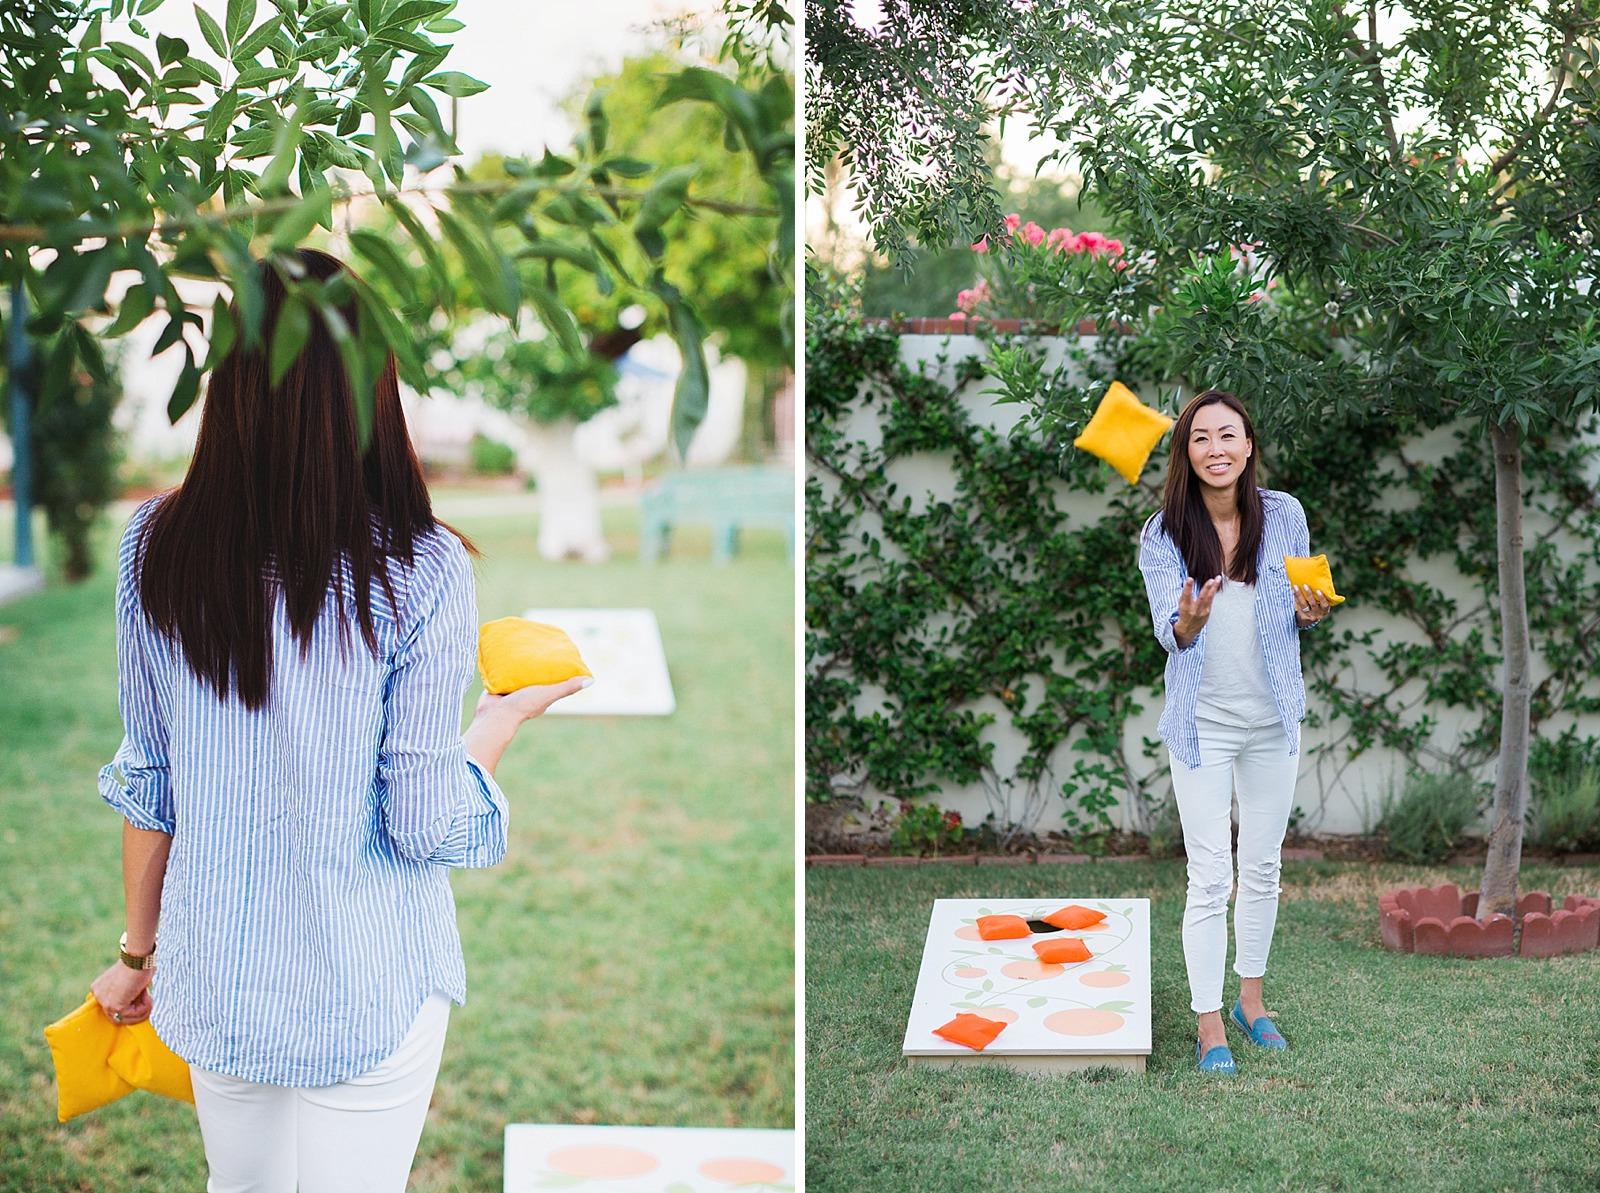 diana-elizabeth-steffen-phoenix-blogger-backyard-games-tosso-com-corn-hole-cornhole-citrus-theme_0102